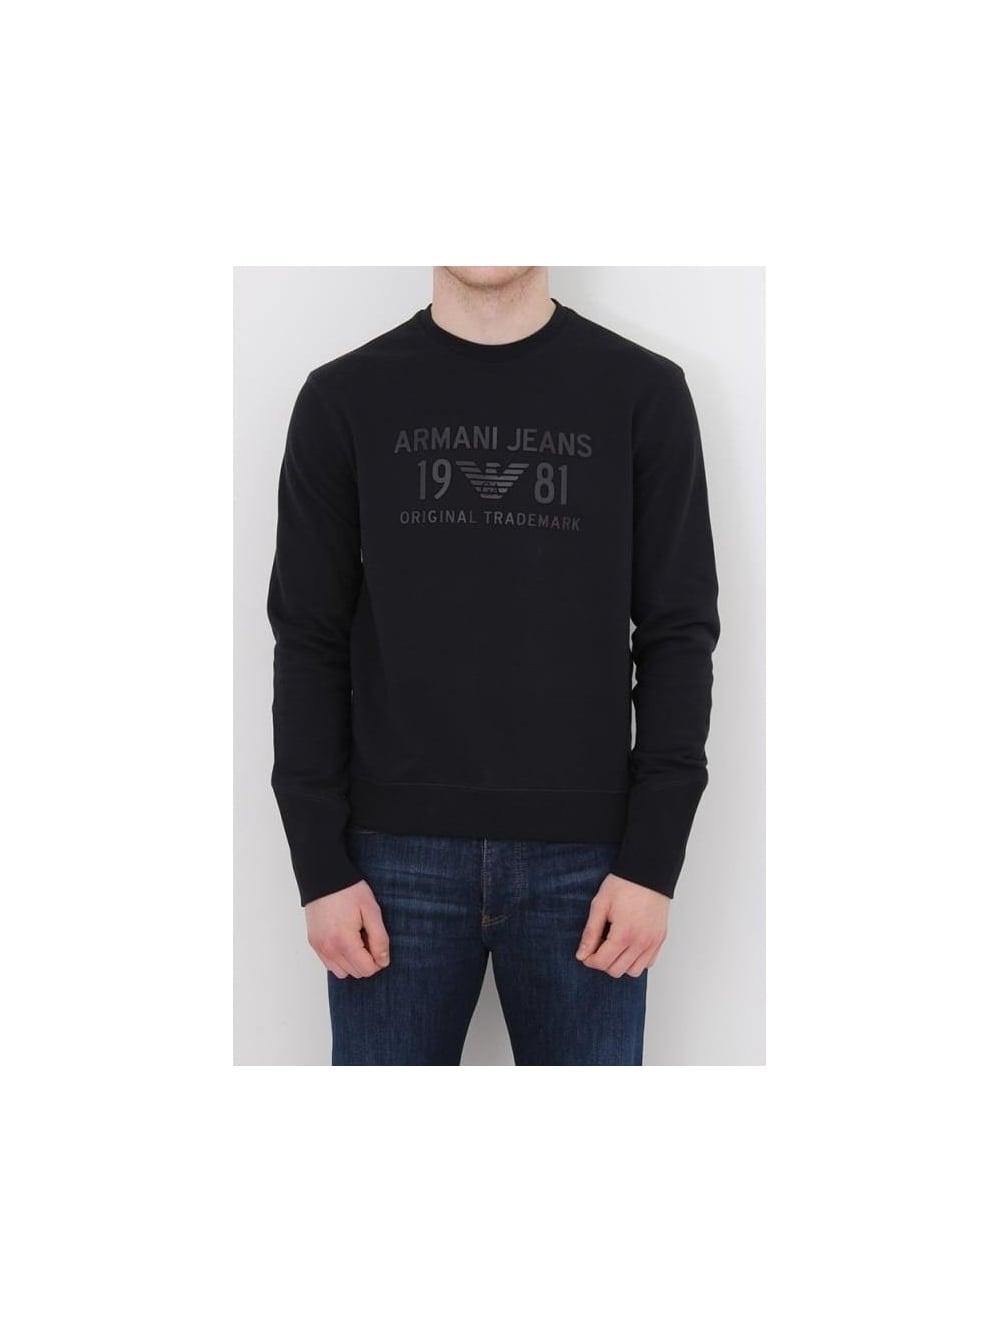 Armani Jeans Rubberised Enhanced Logo Sweat In Dark Navy - Northern ... 4a383d7db399